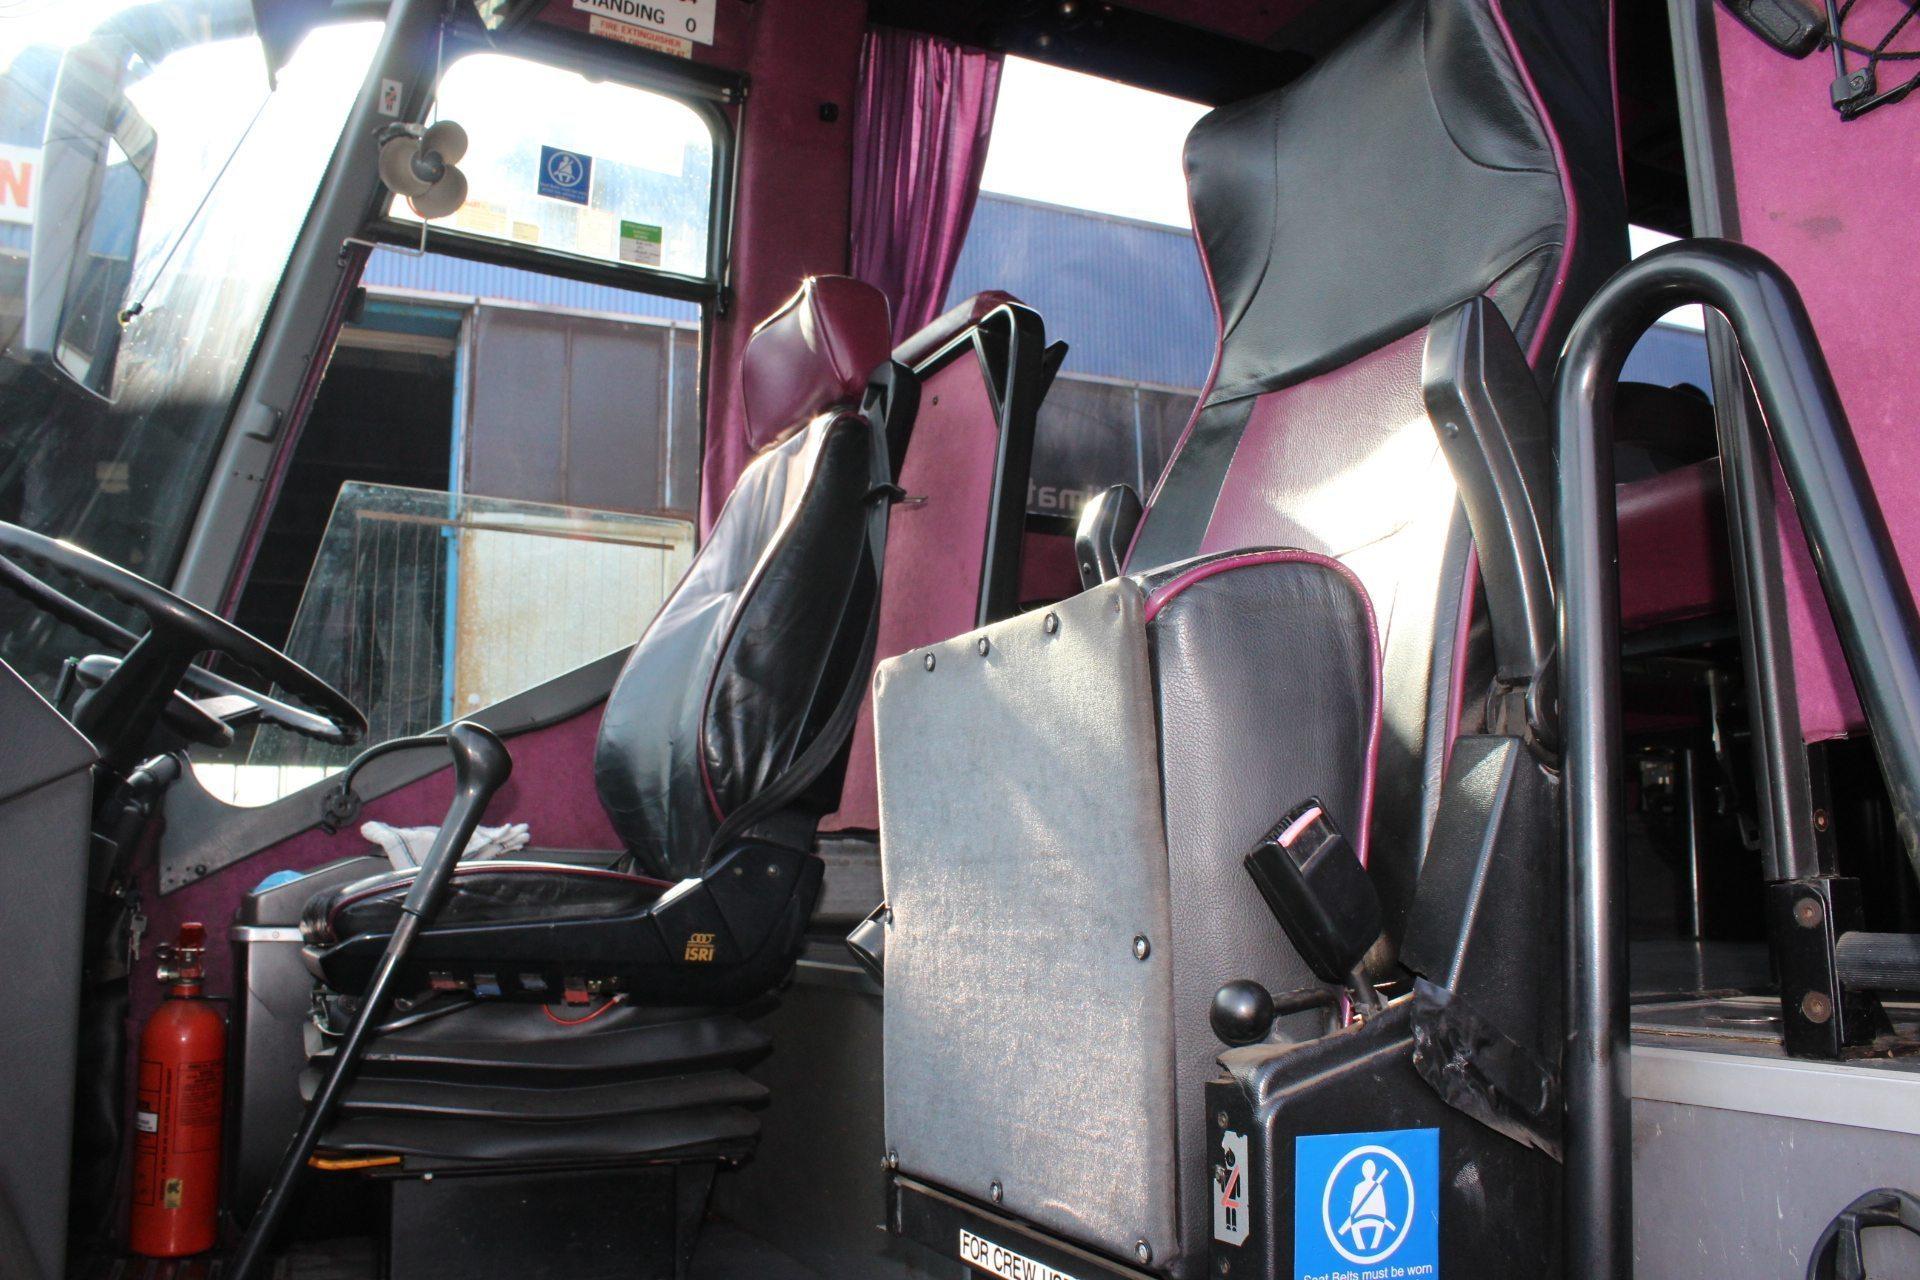 97 Bova Futura Fhd 10 Metre 34 Seats Hills Coaches